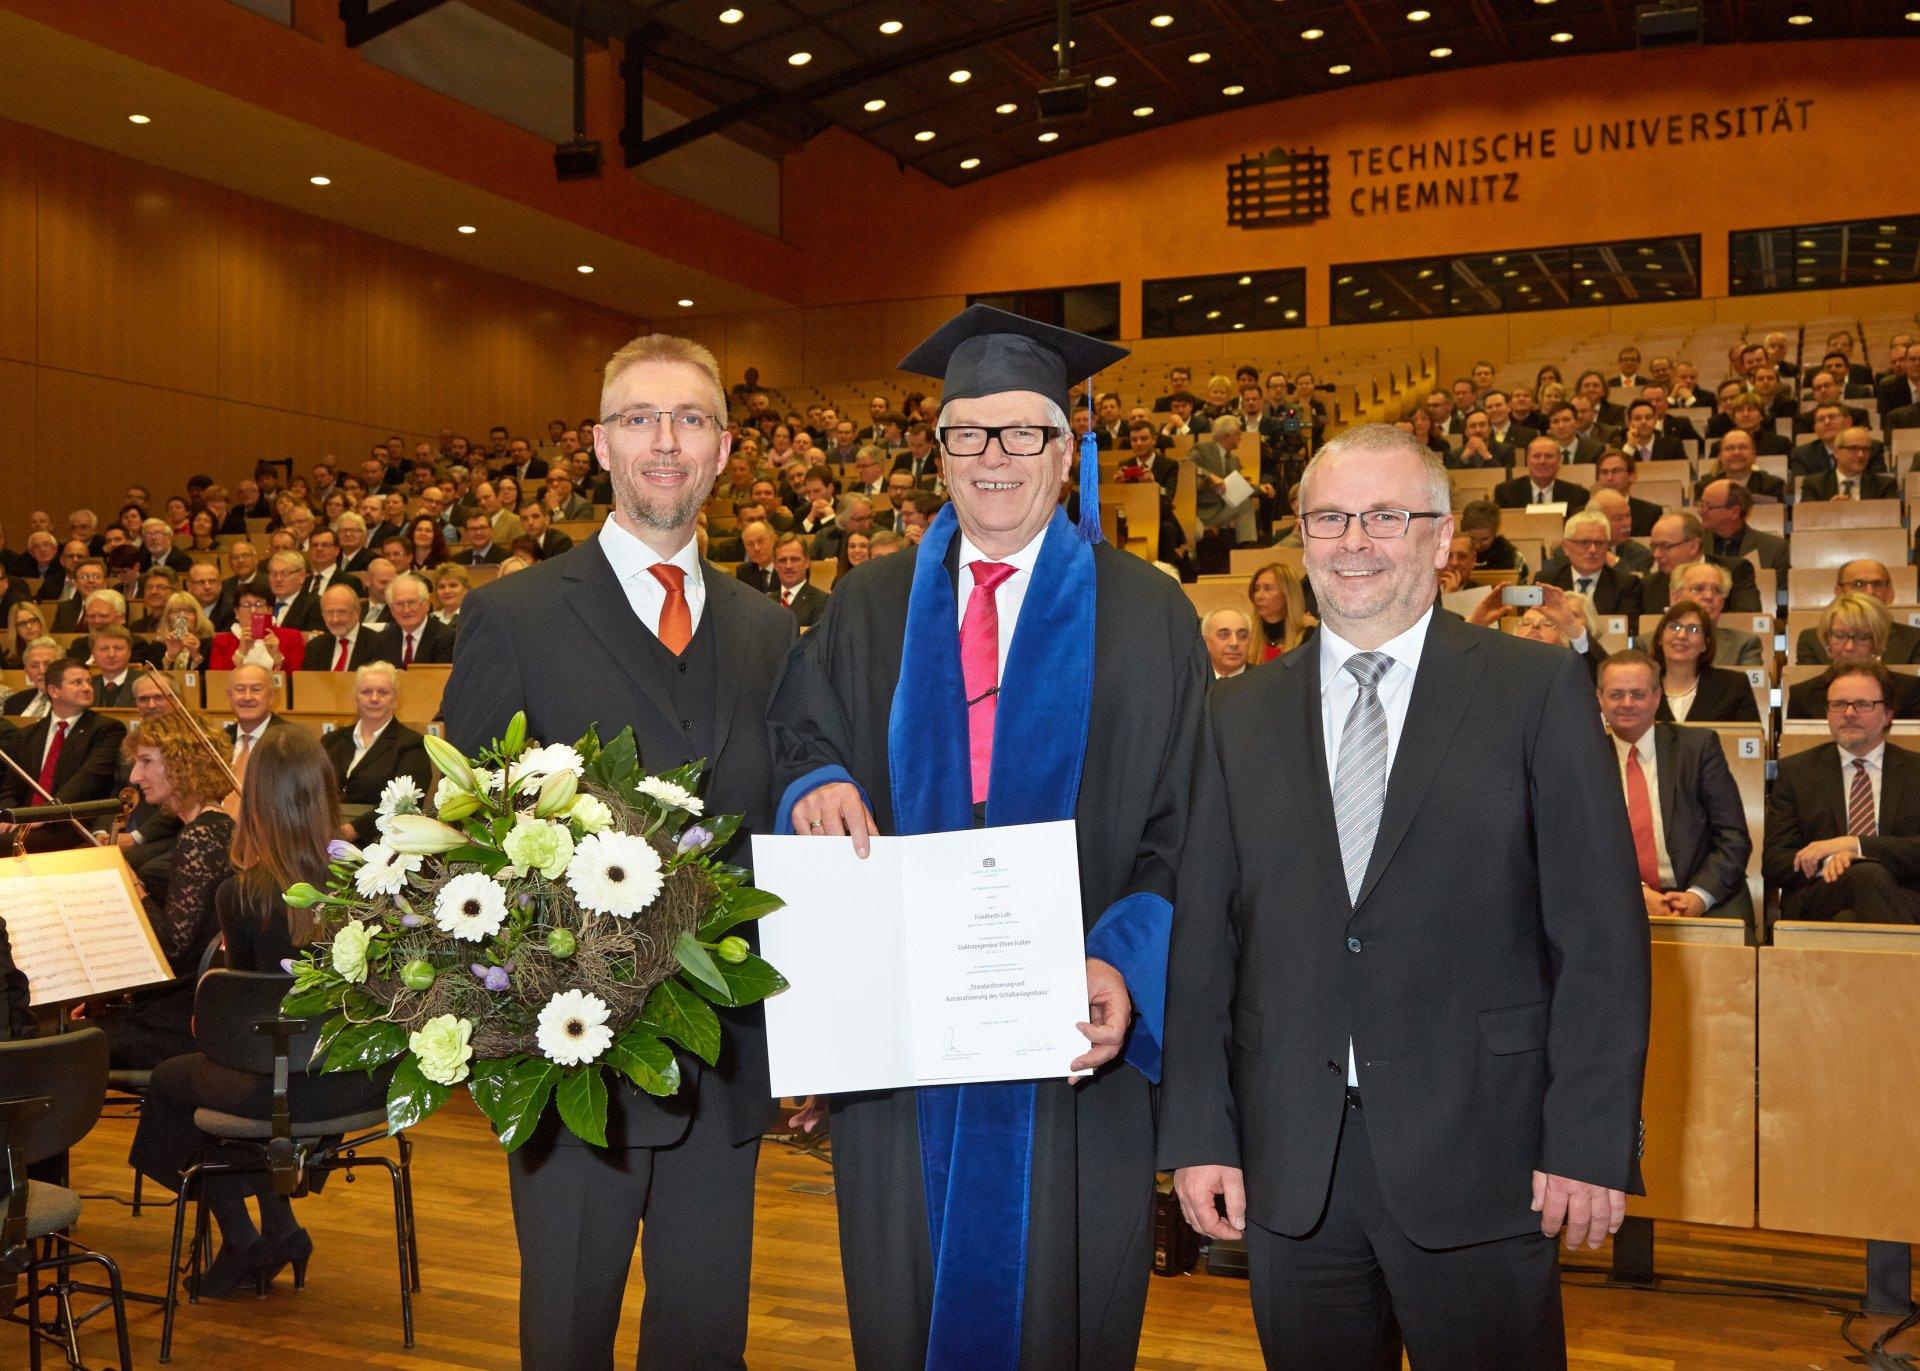 Verleihung der Ehrendoktorwürde an Friedhelm Loh